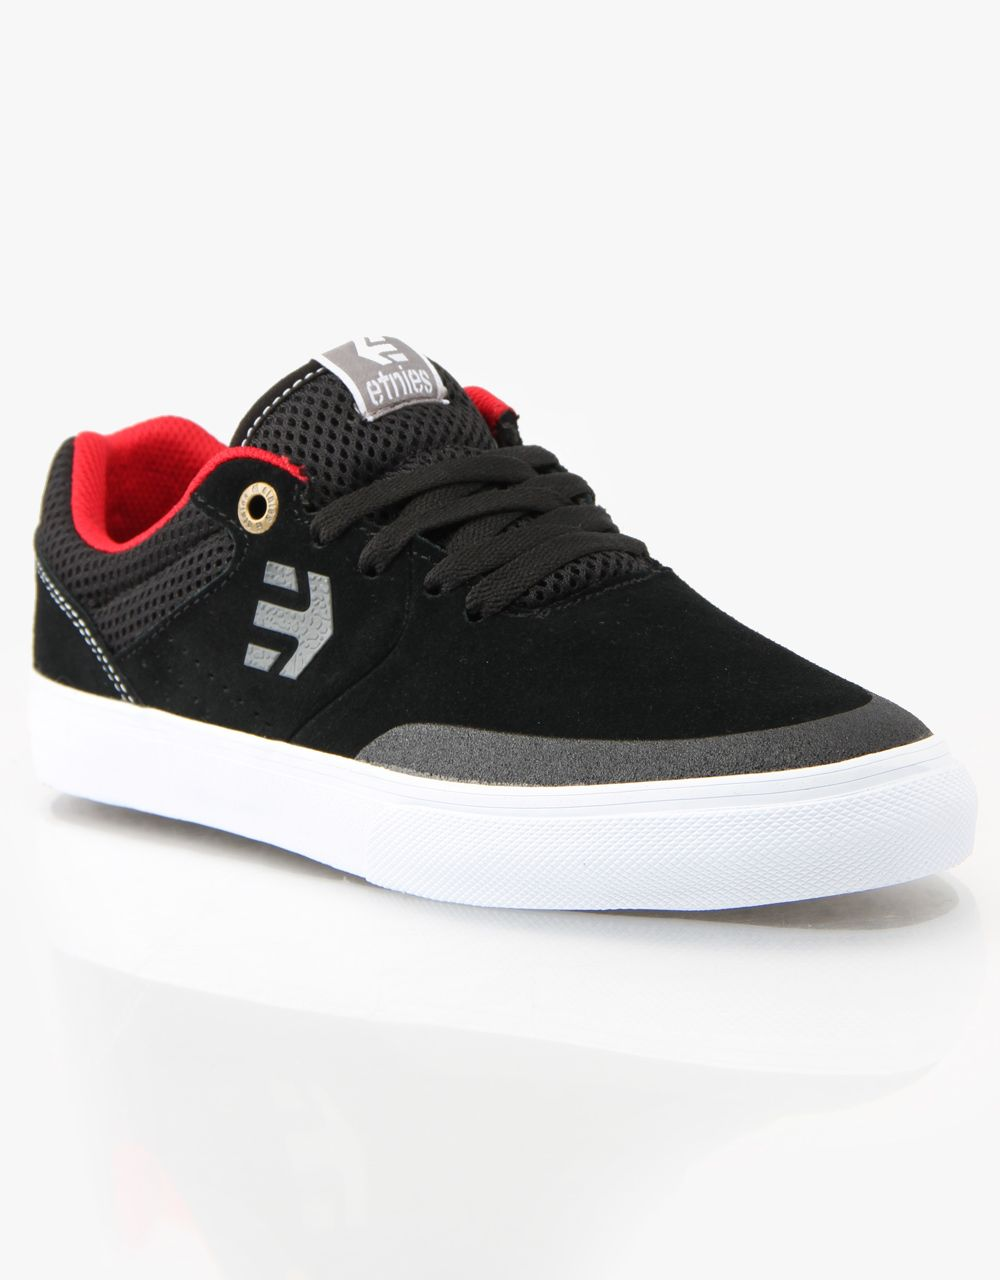 Etnies Marana Vulc Nick Garcia Skate Shoes - Black